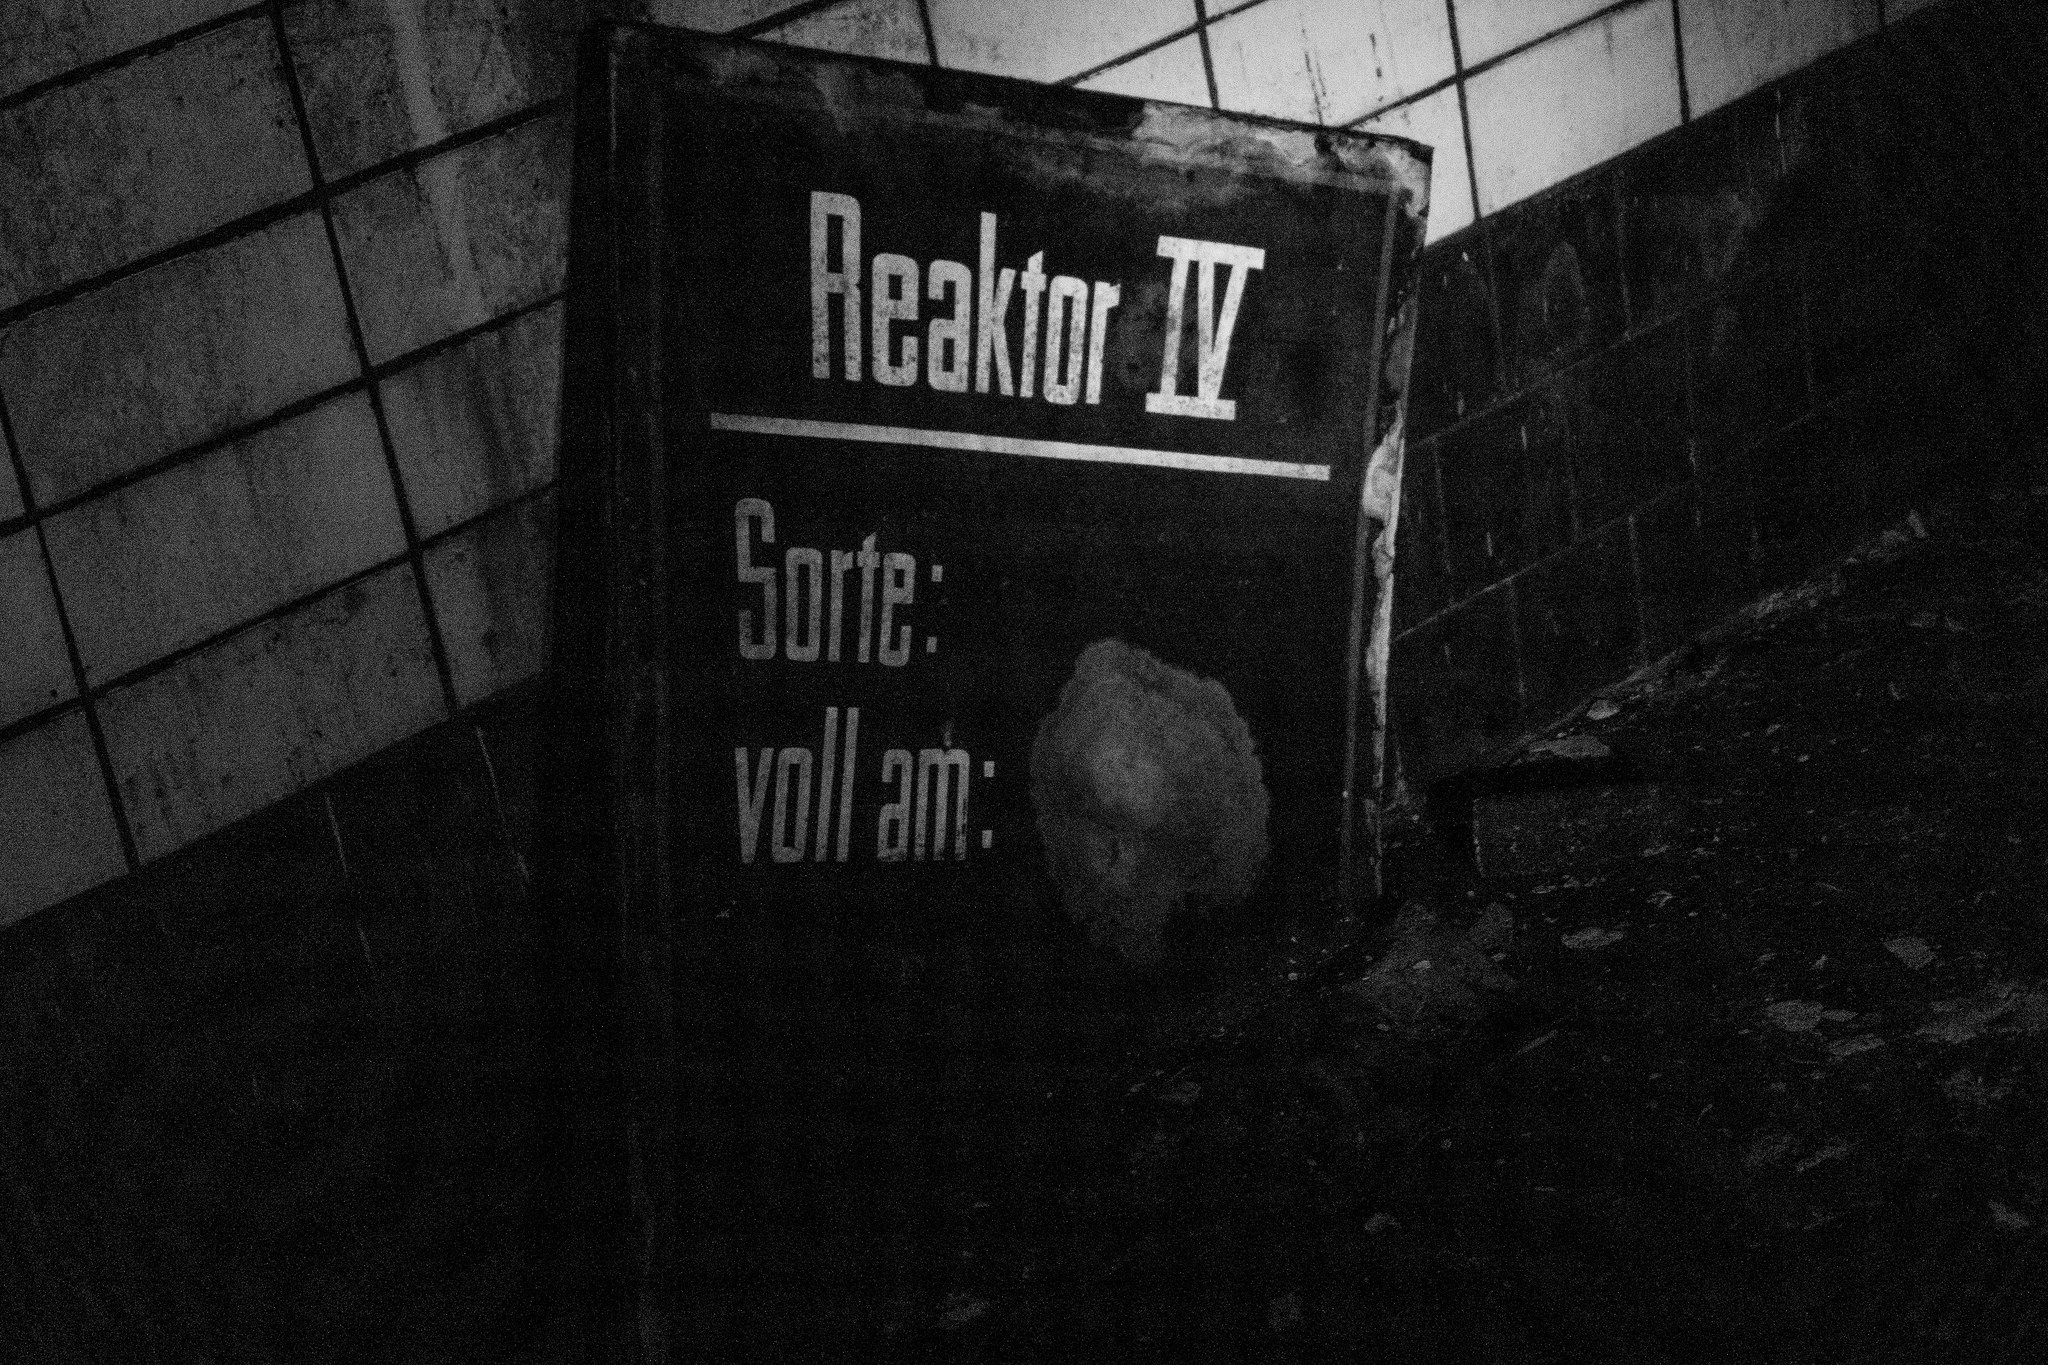 Reaktor IV